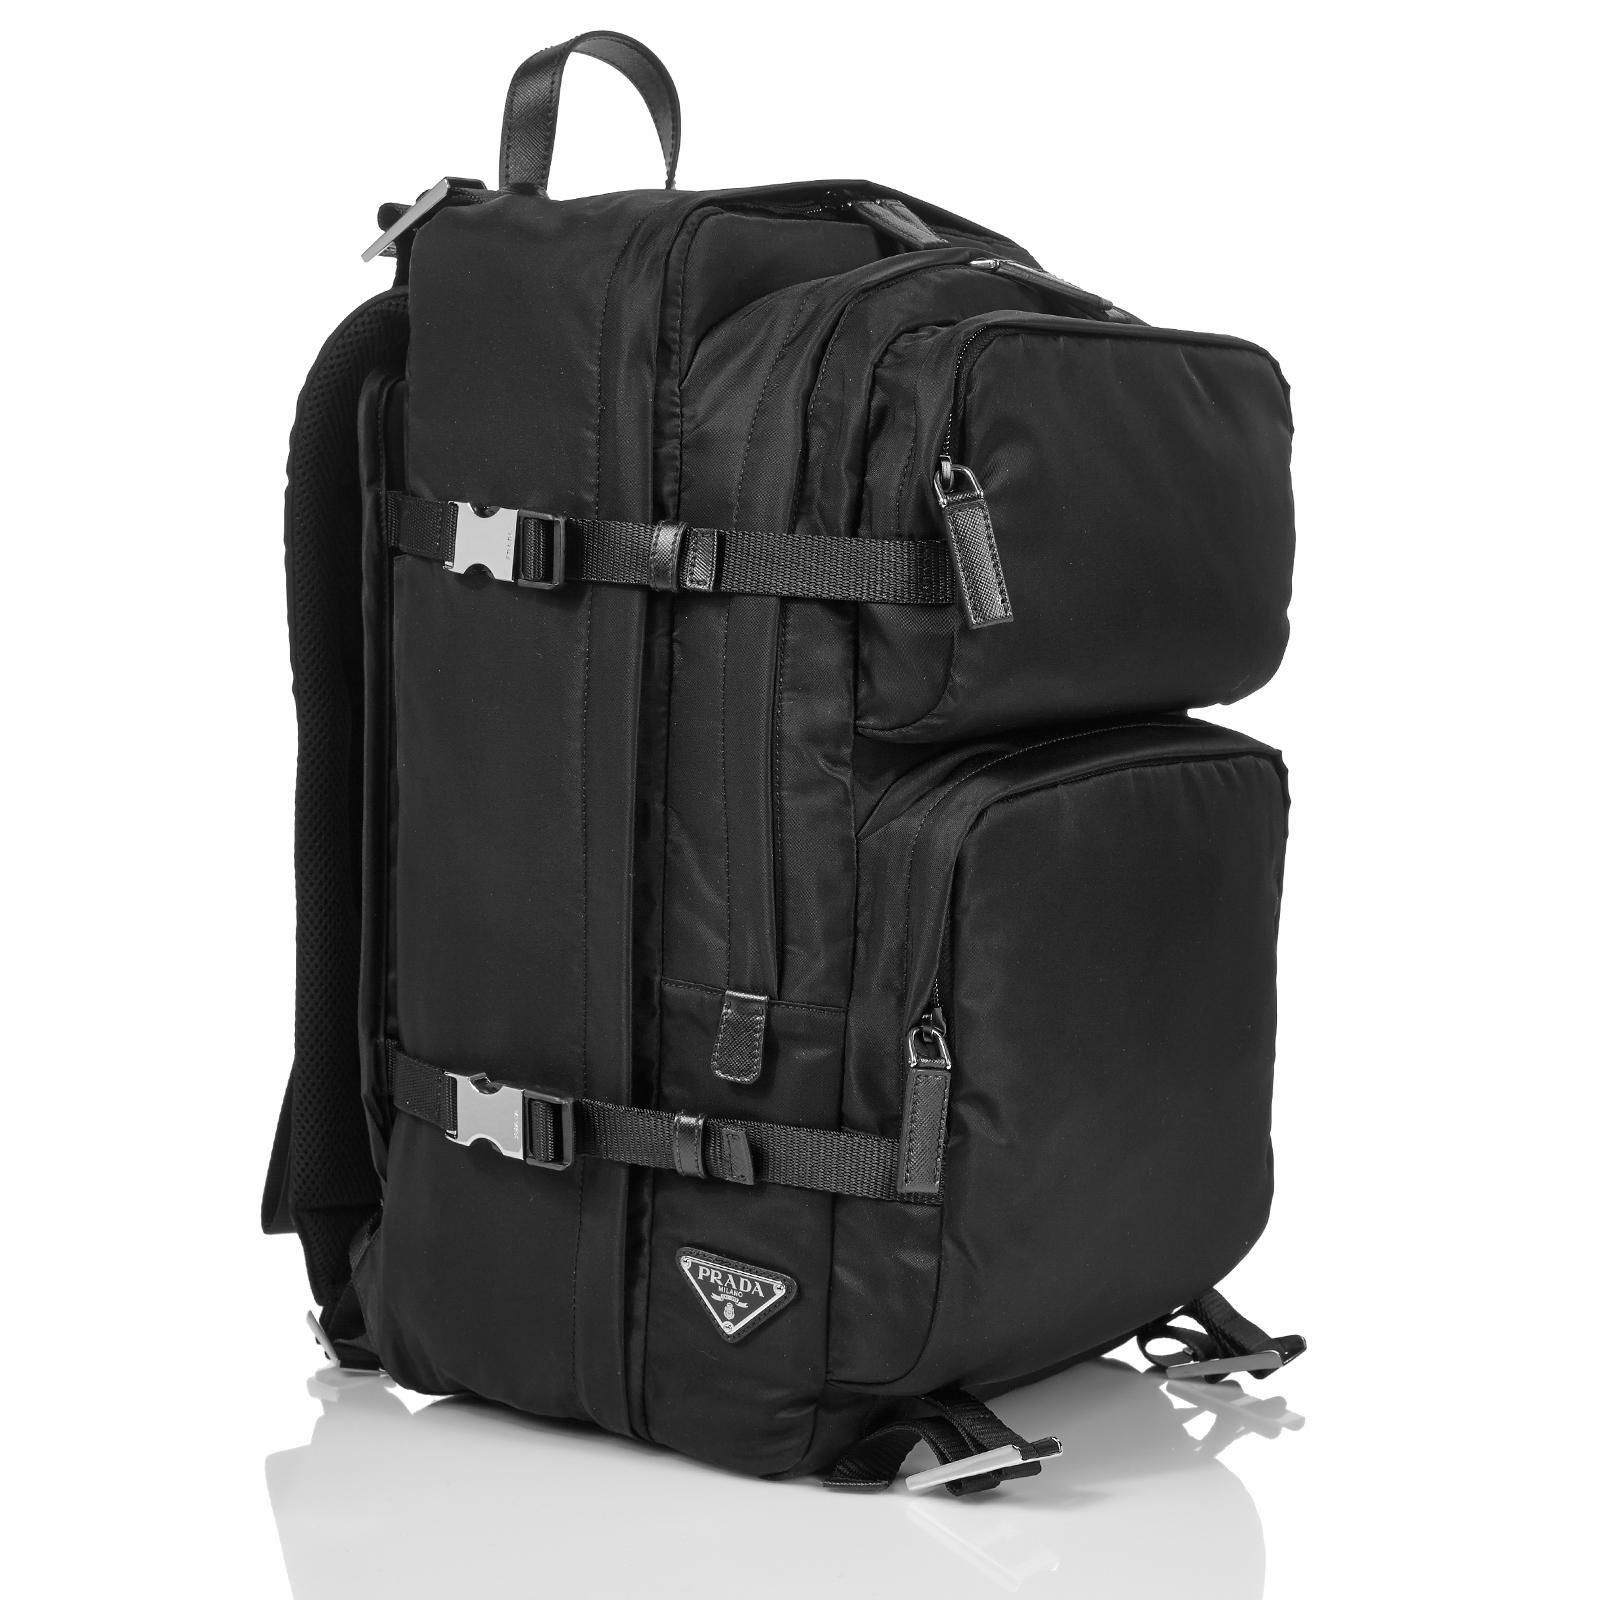 7fca16f918ada7 Prada Backpack Bags Briefcases Nylon Black ref.44597 - Joli Closet